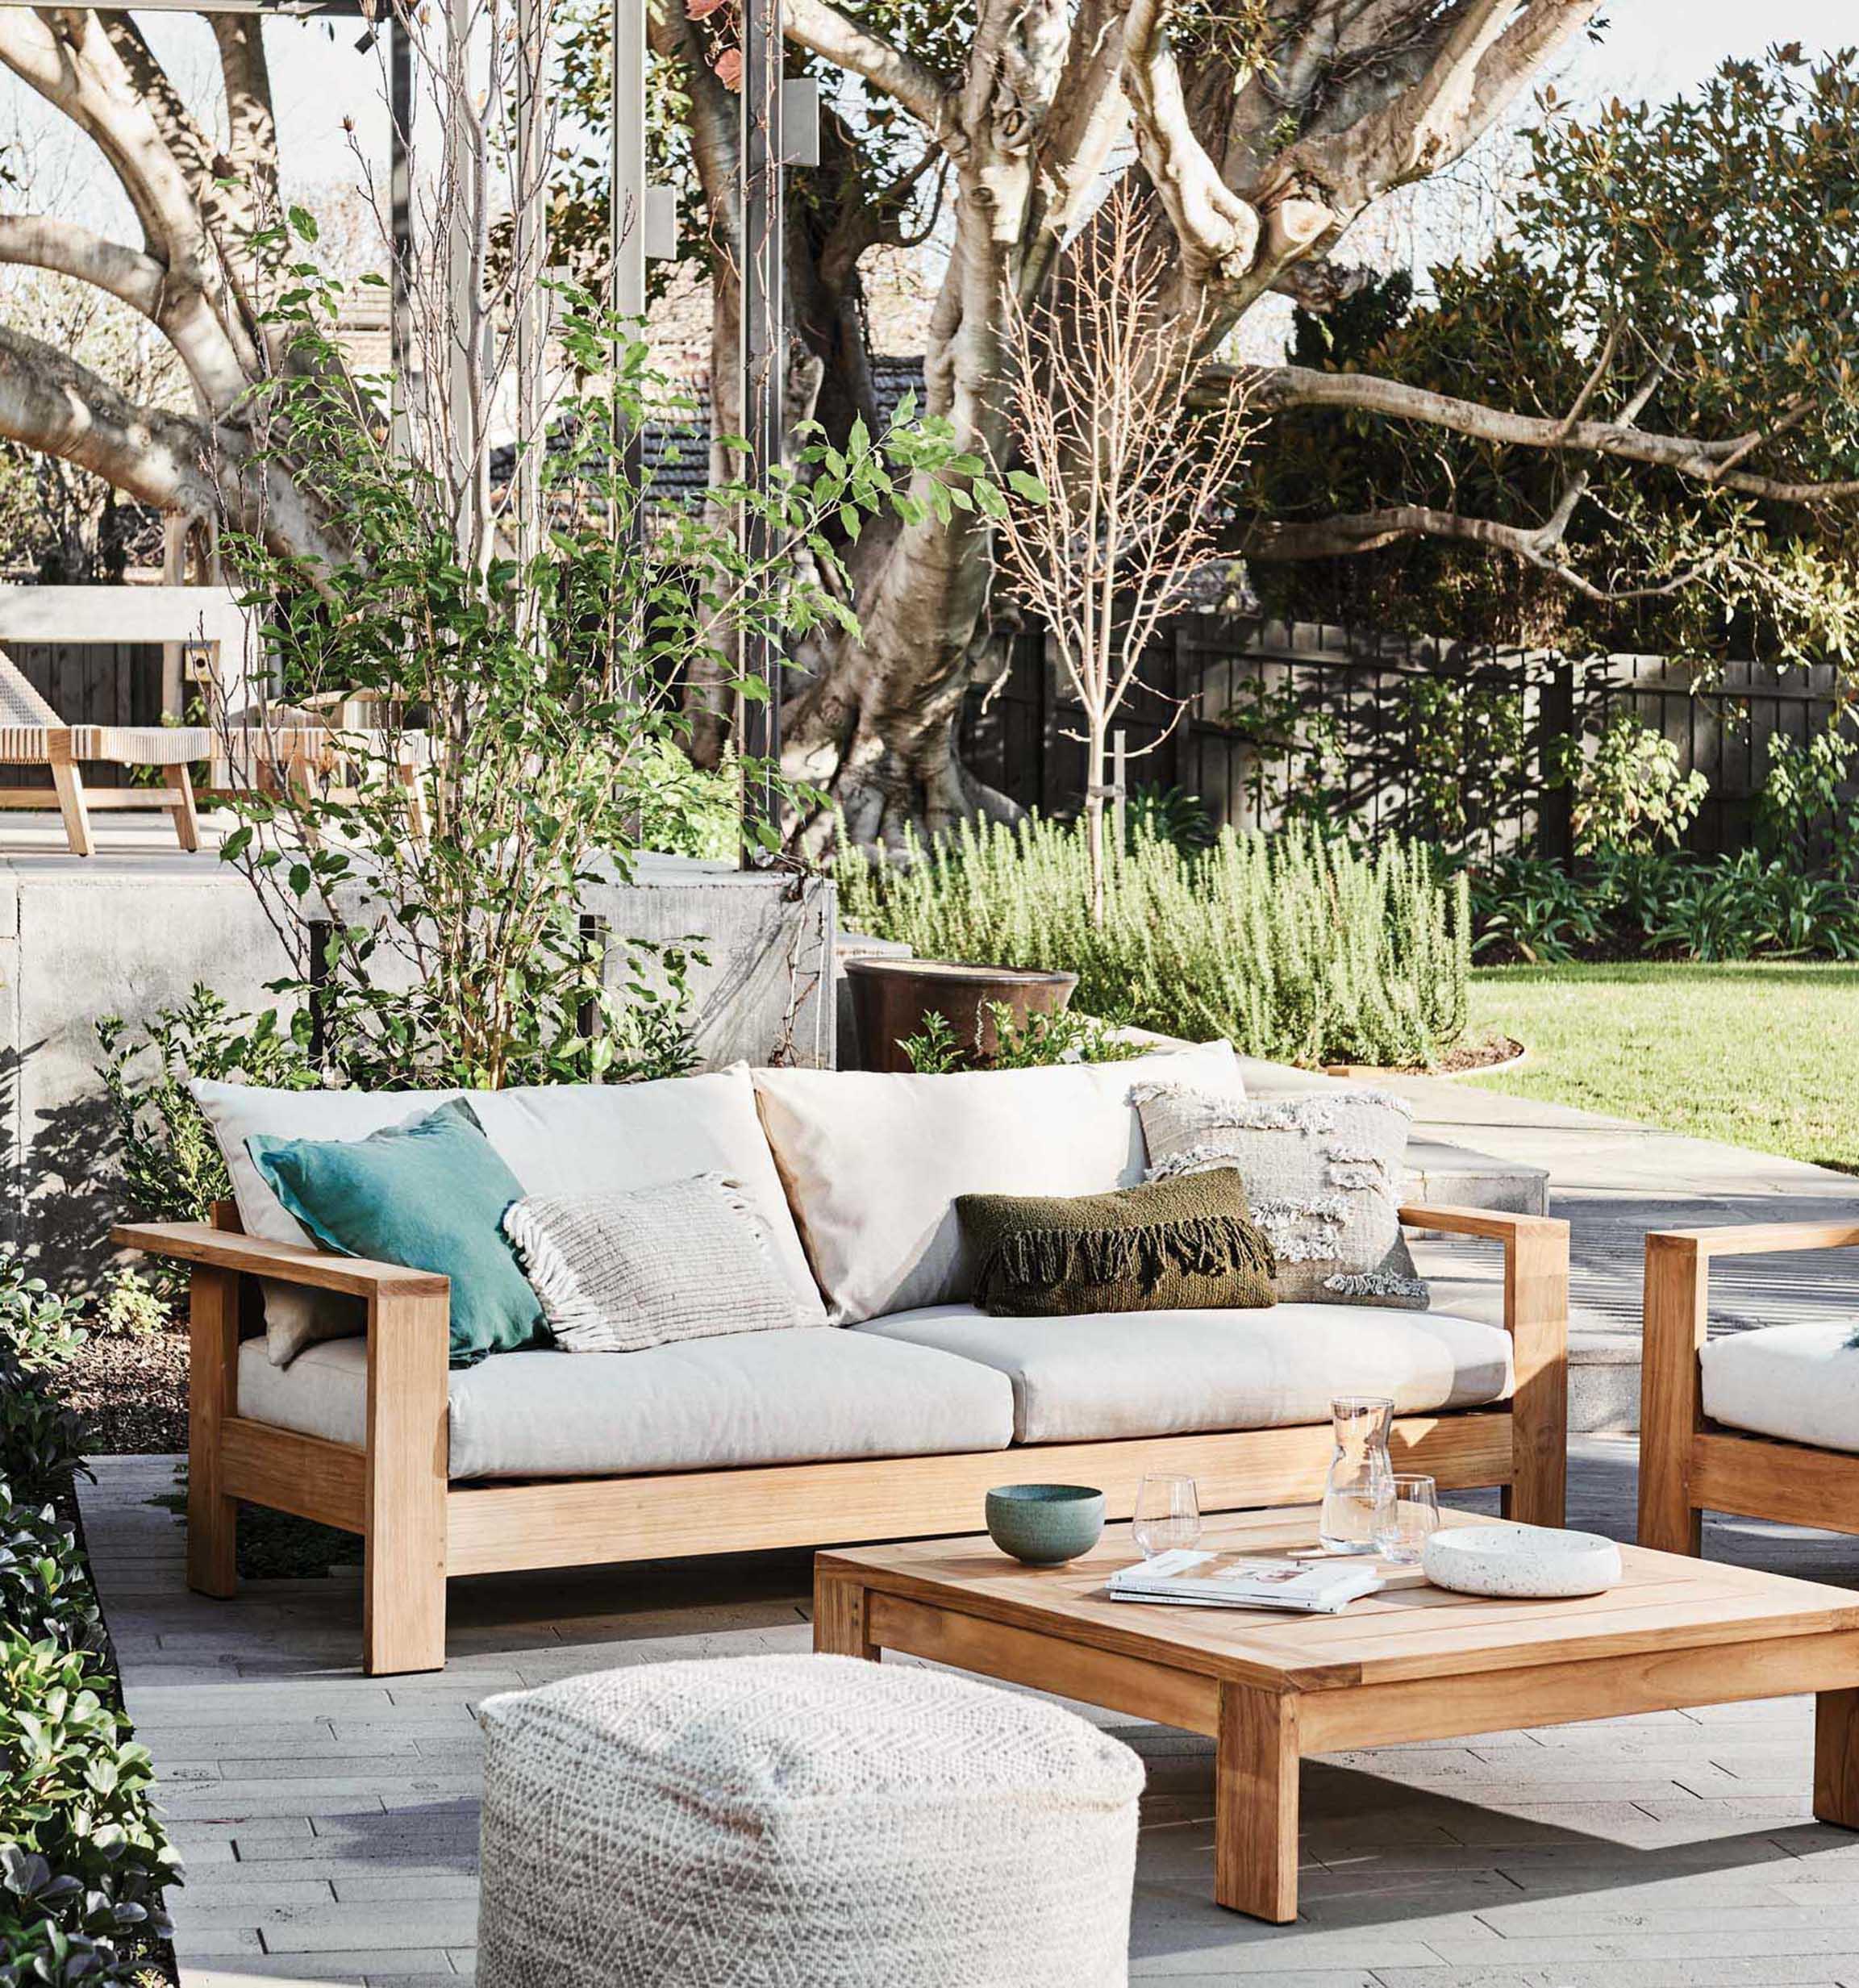 Furniture menu-images sofas